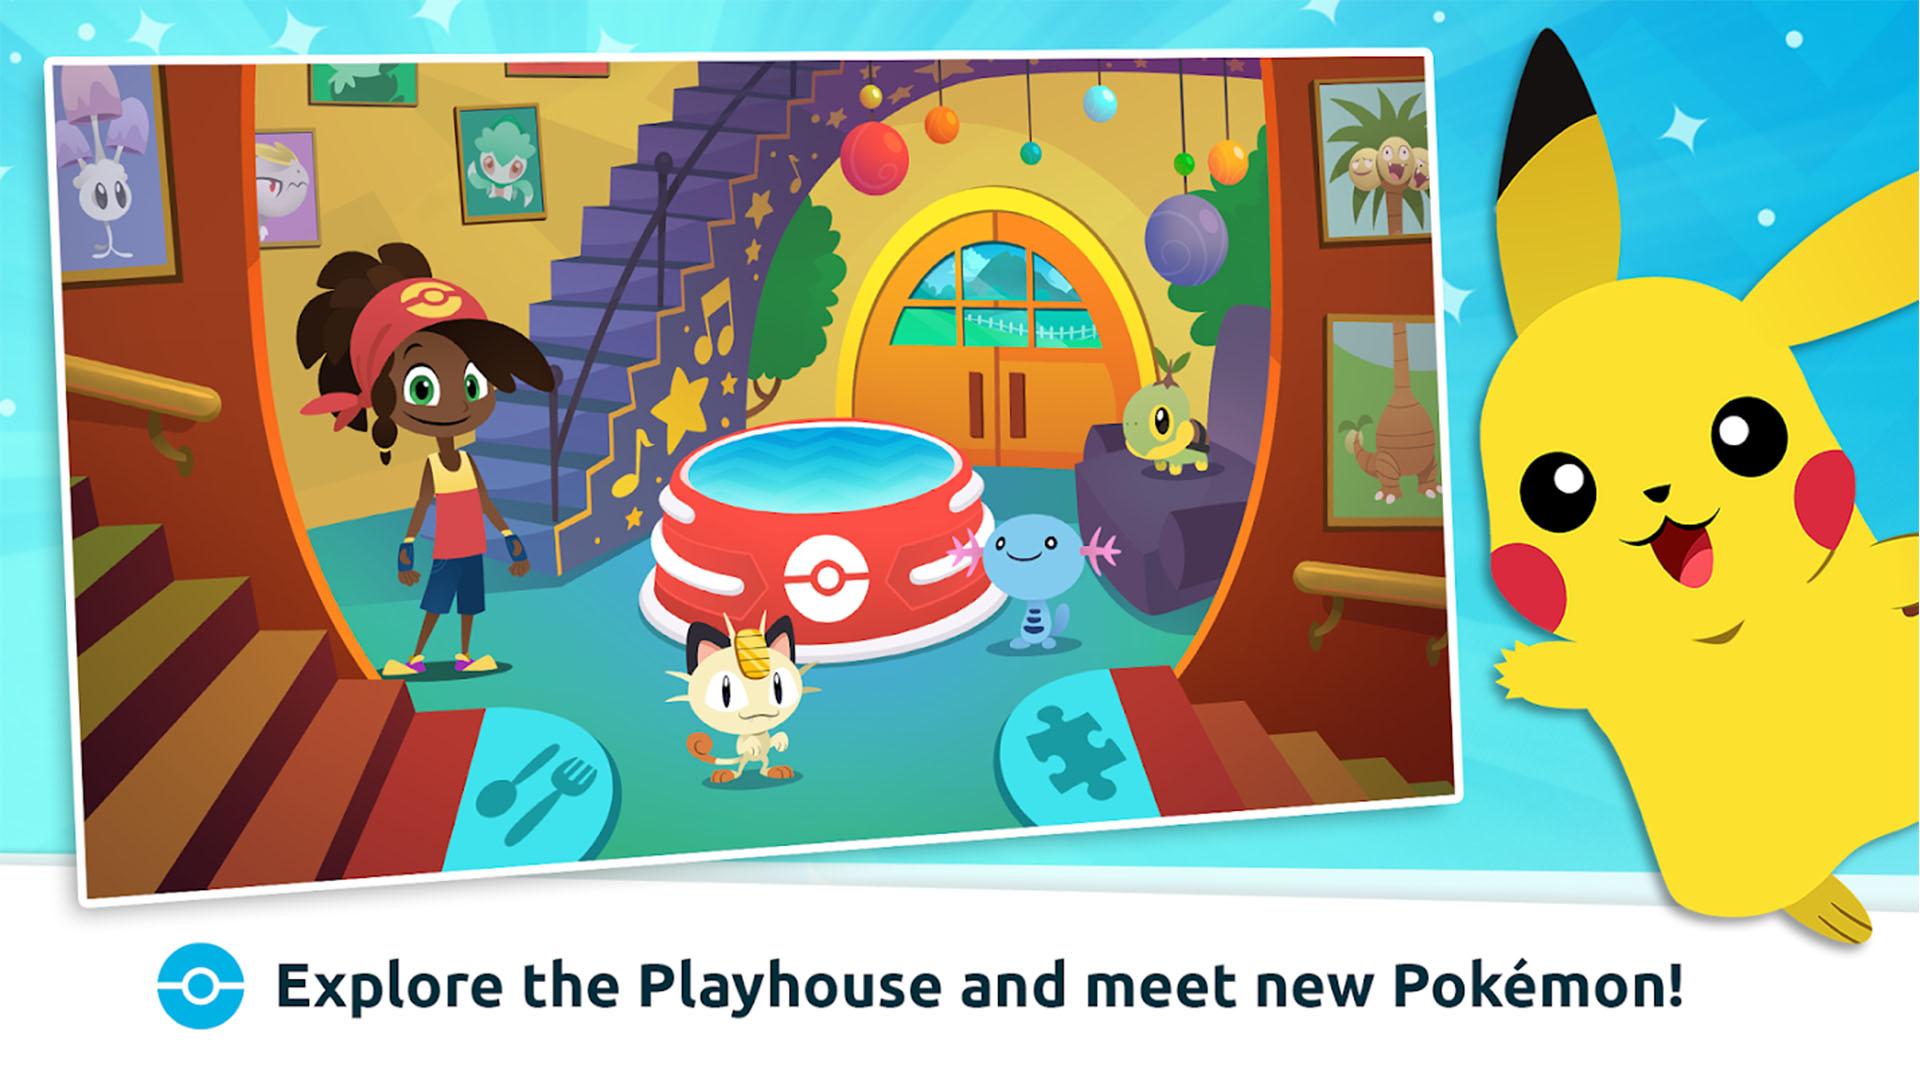 Pokemon Playhouse screenshot 2021